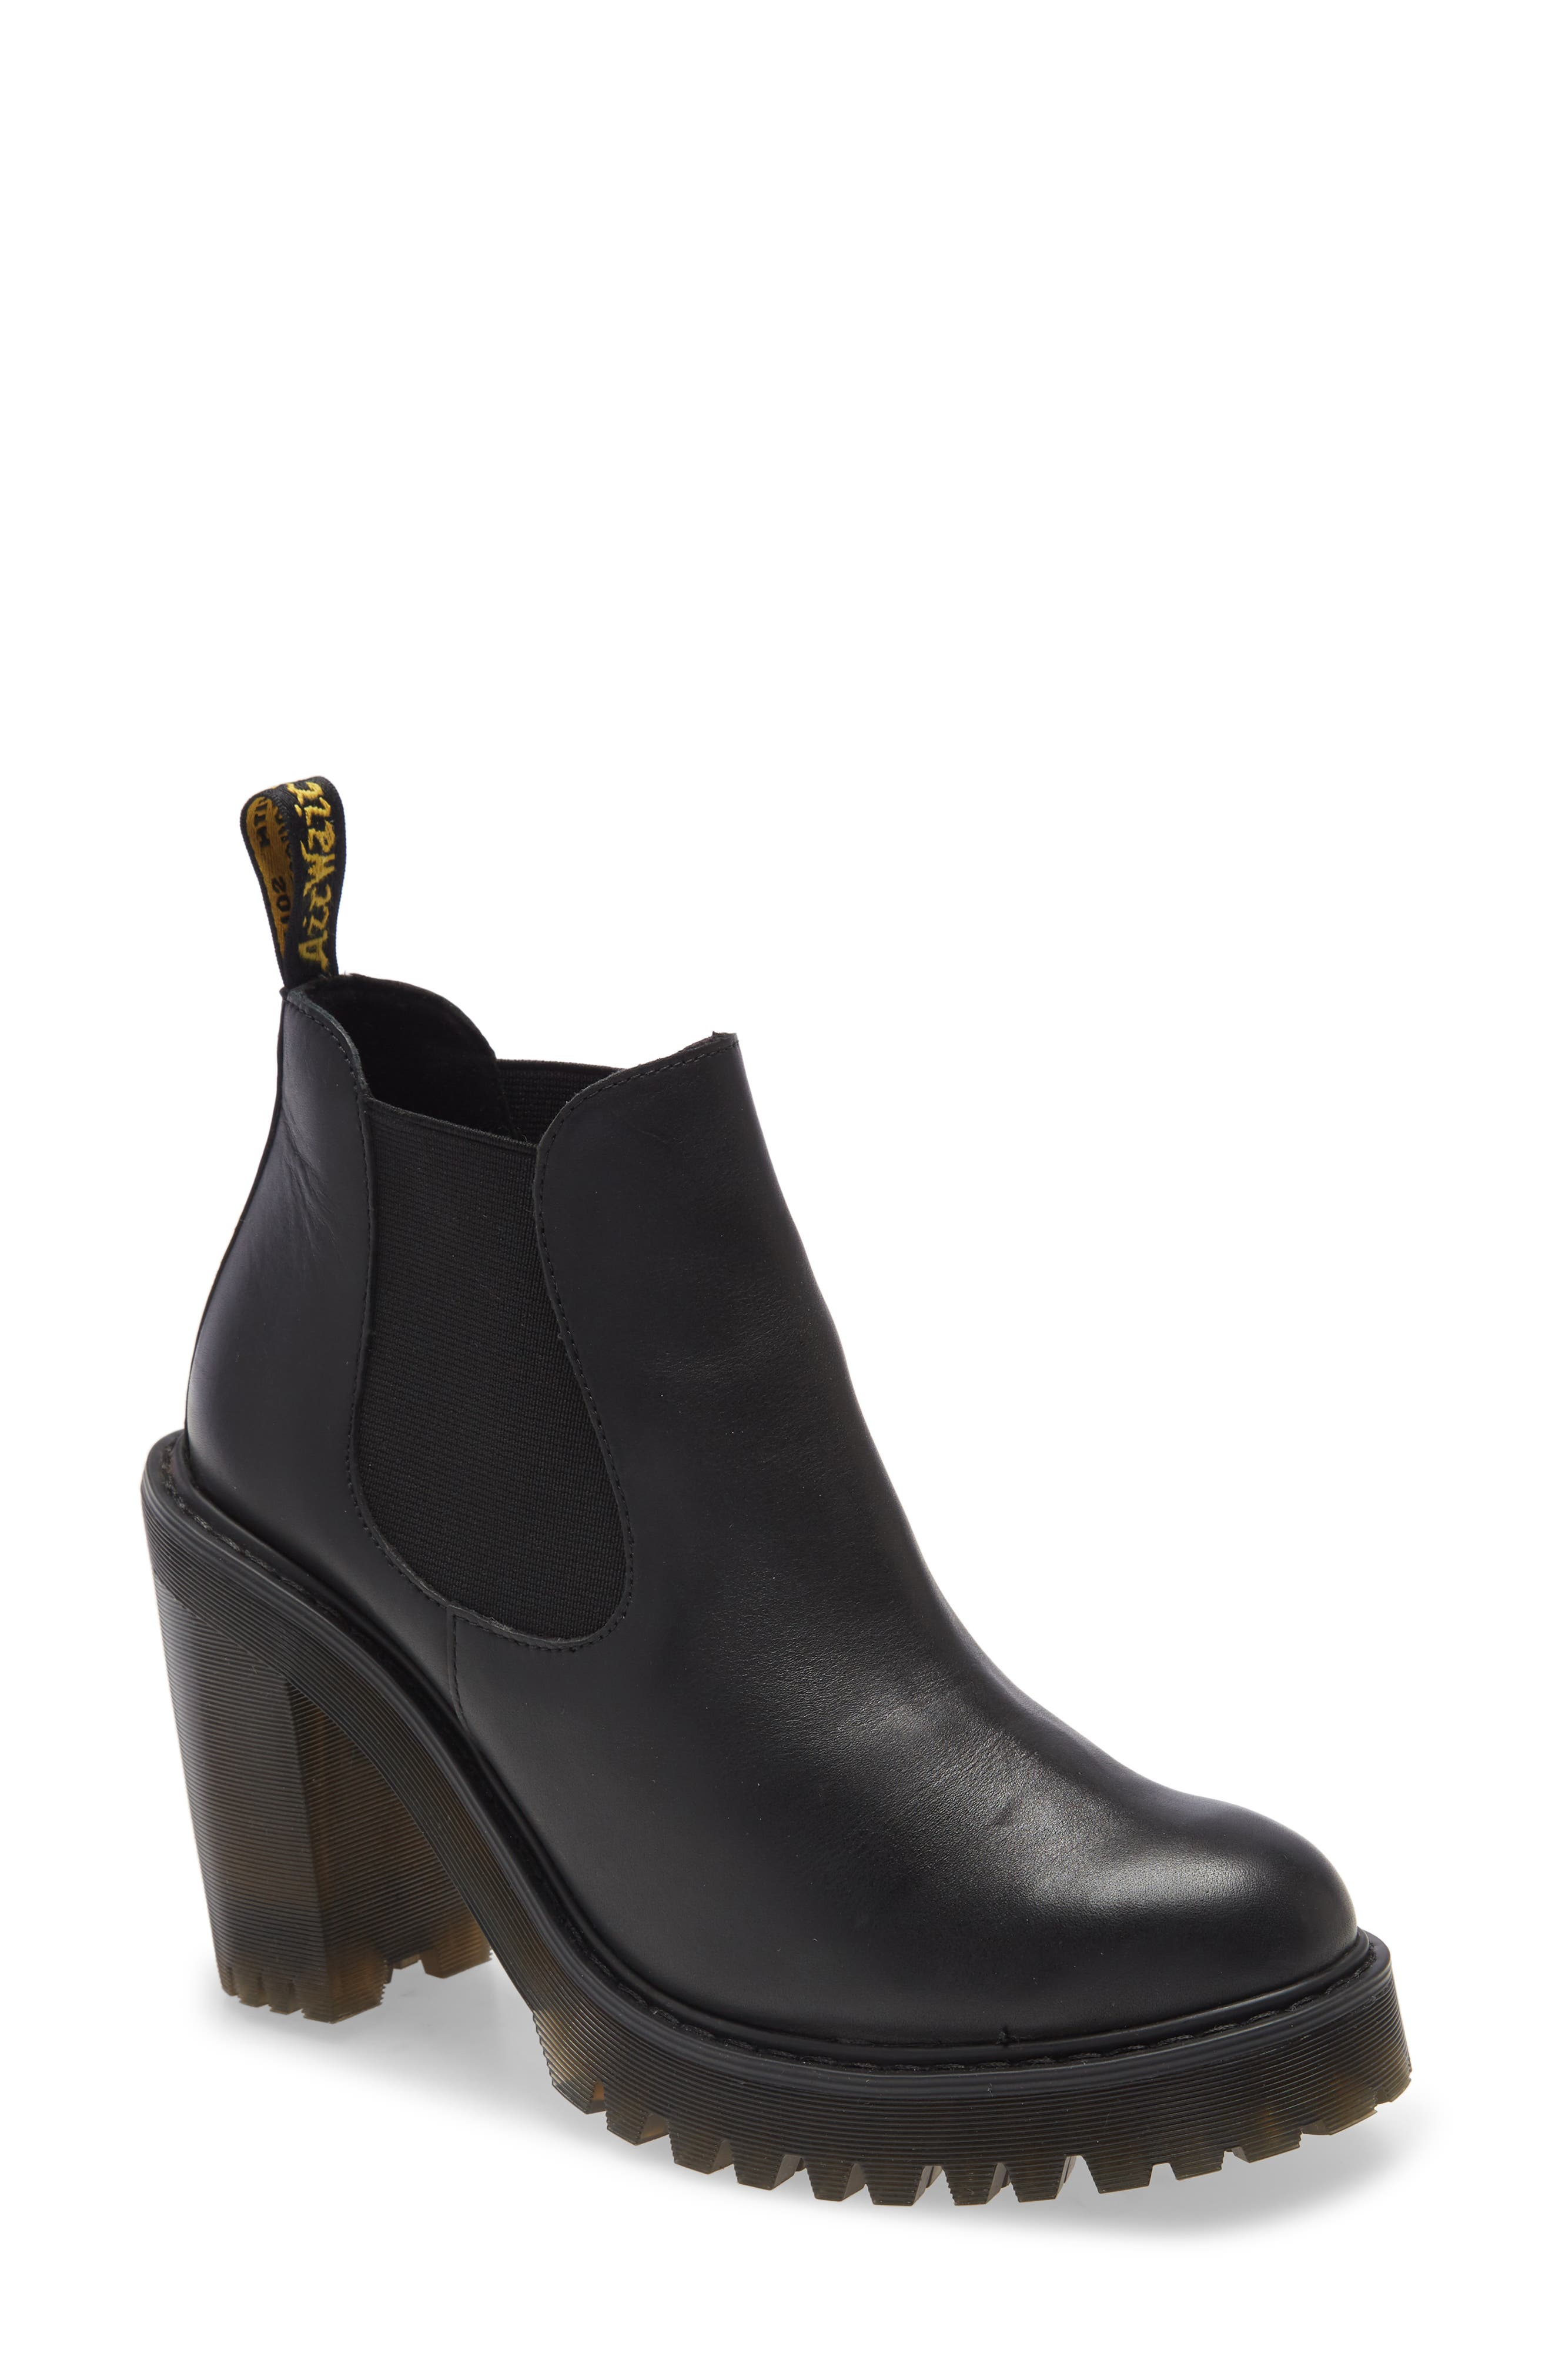 Image of Dr. Martens Hurston Chelsea Boot